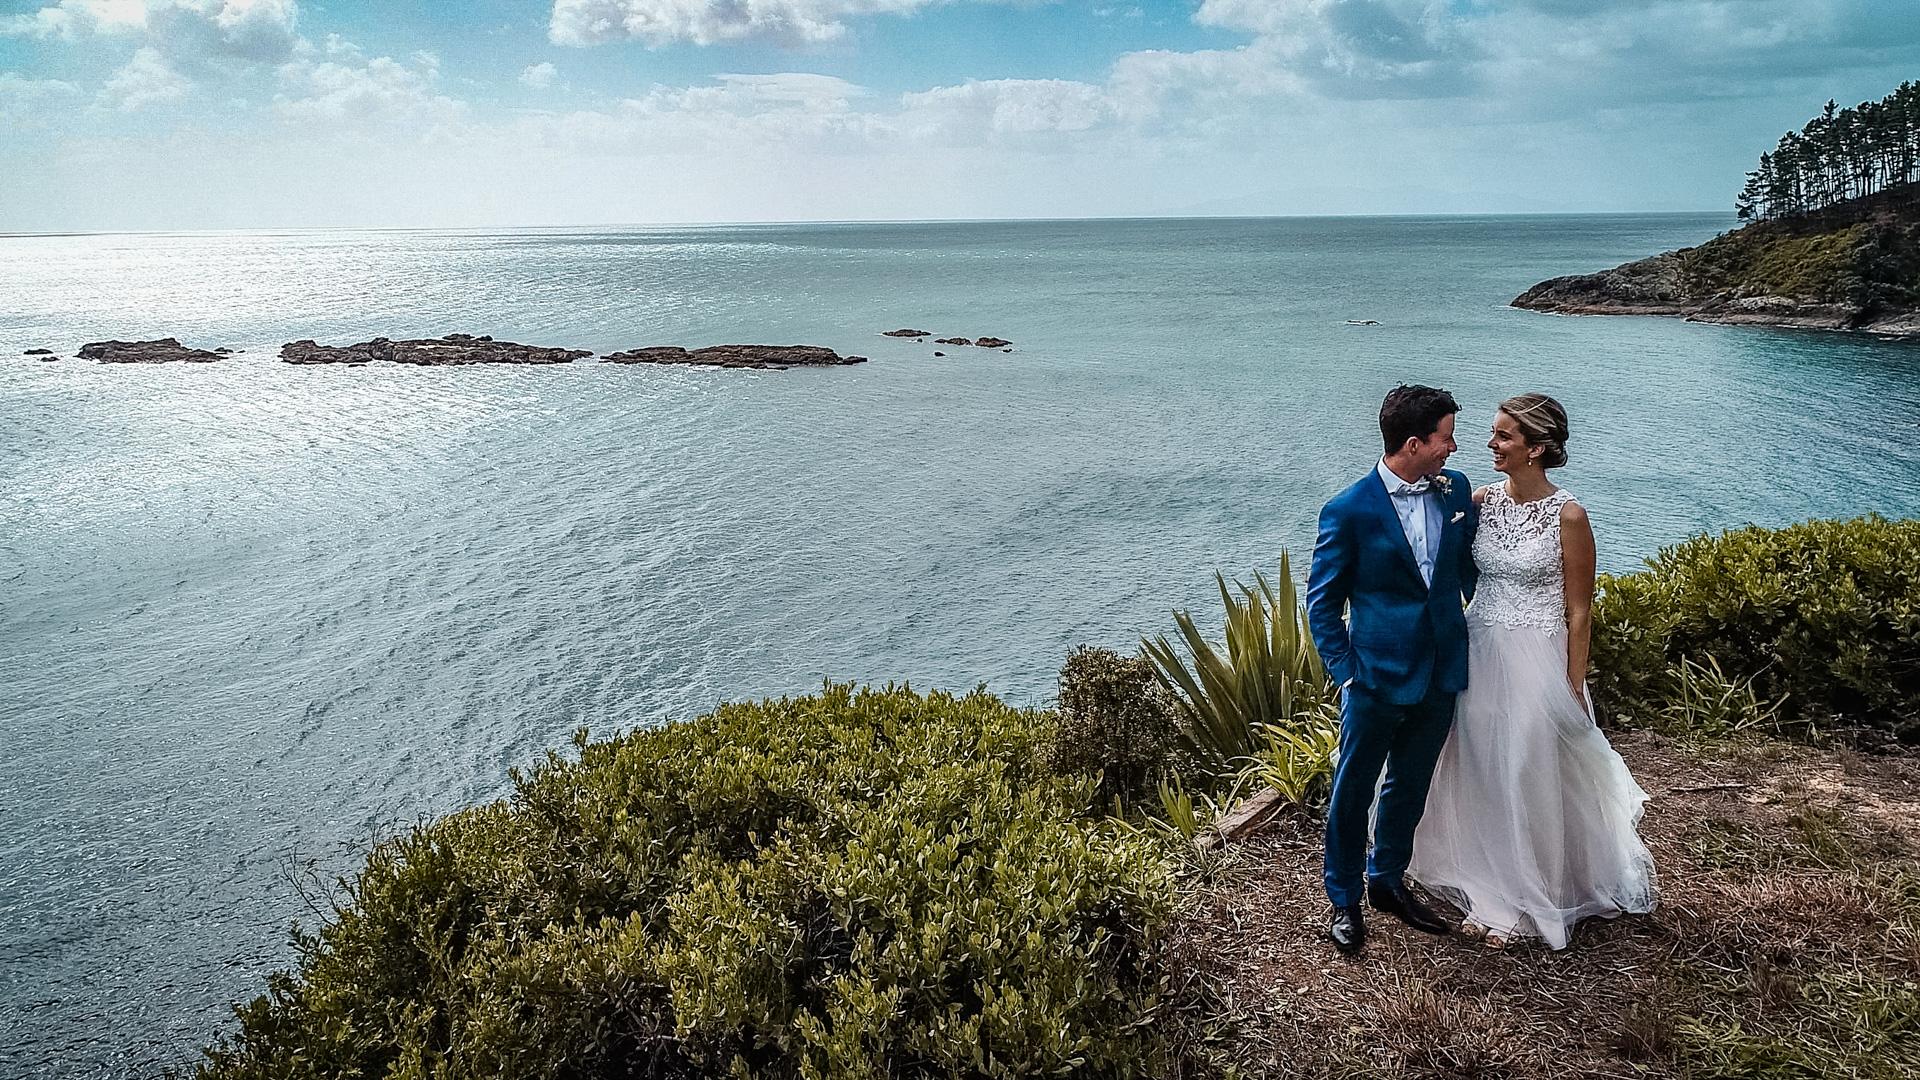 Jacqui & Mike - Waiheke Island